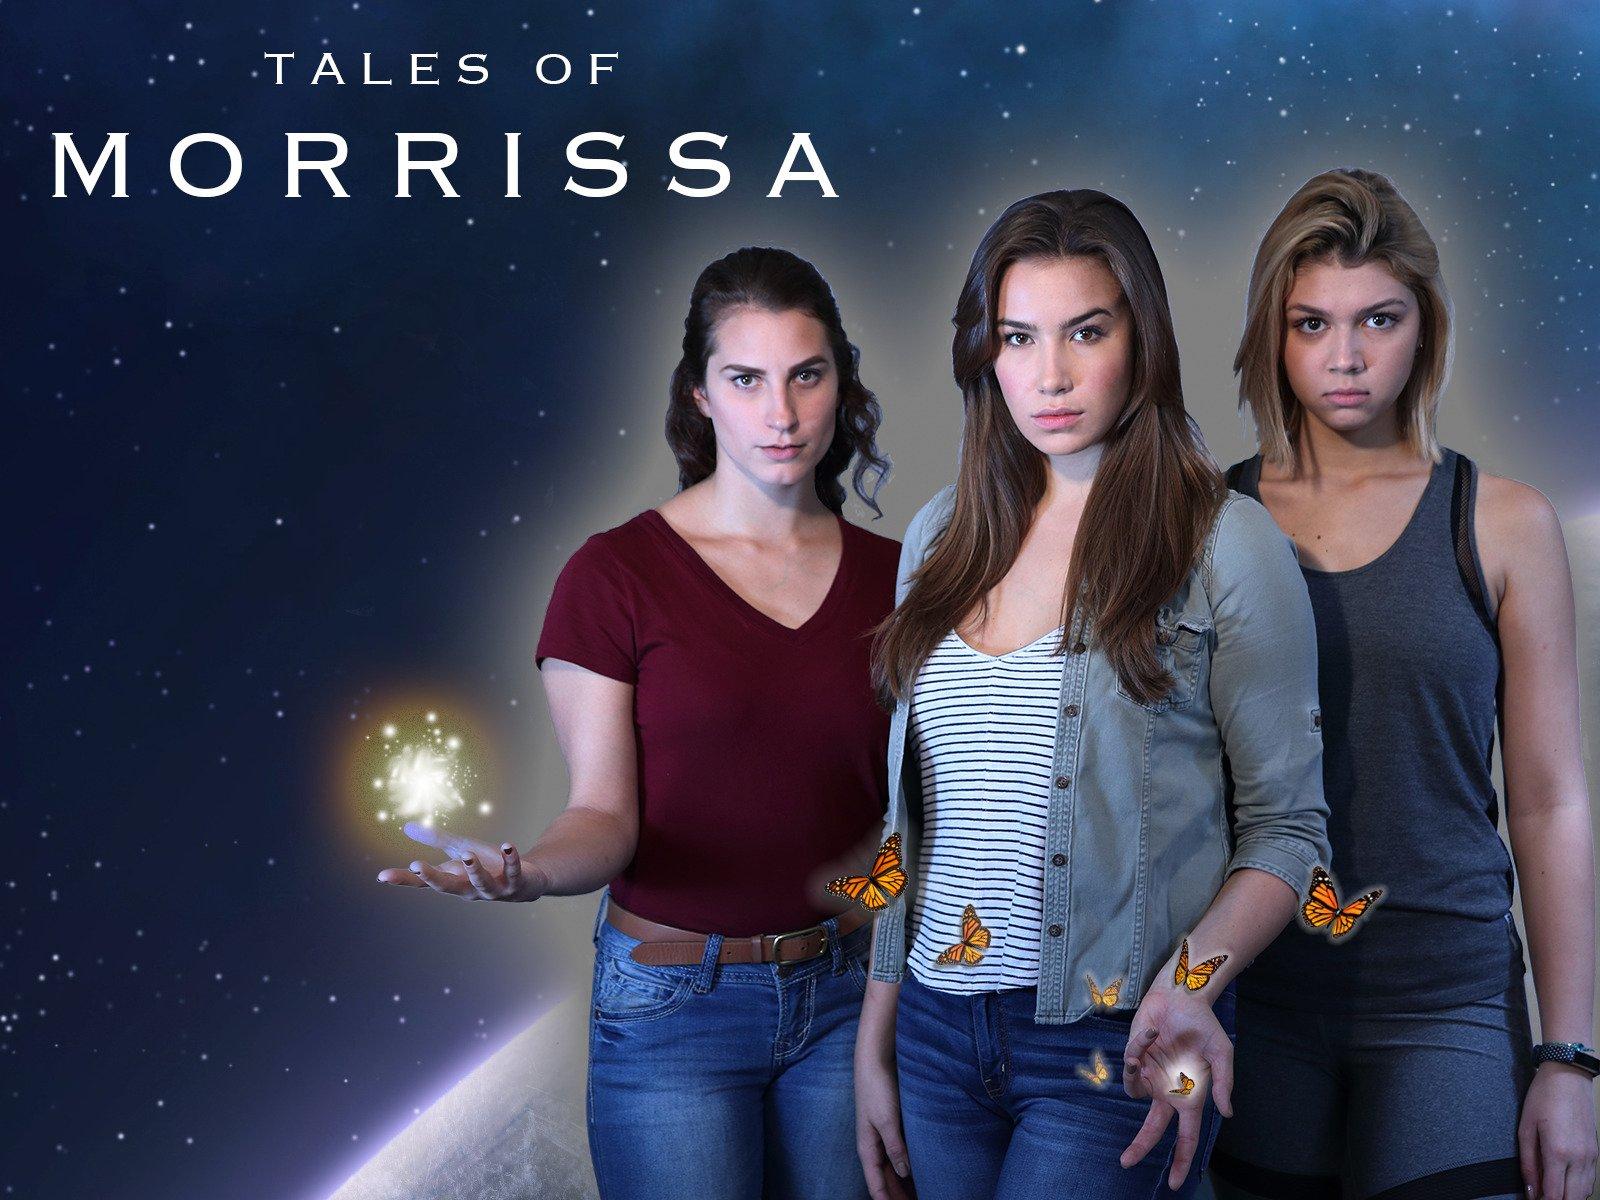 Tales of Morrissa